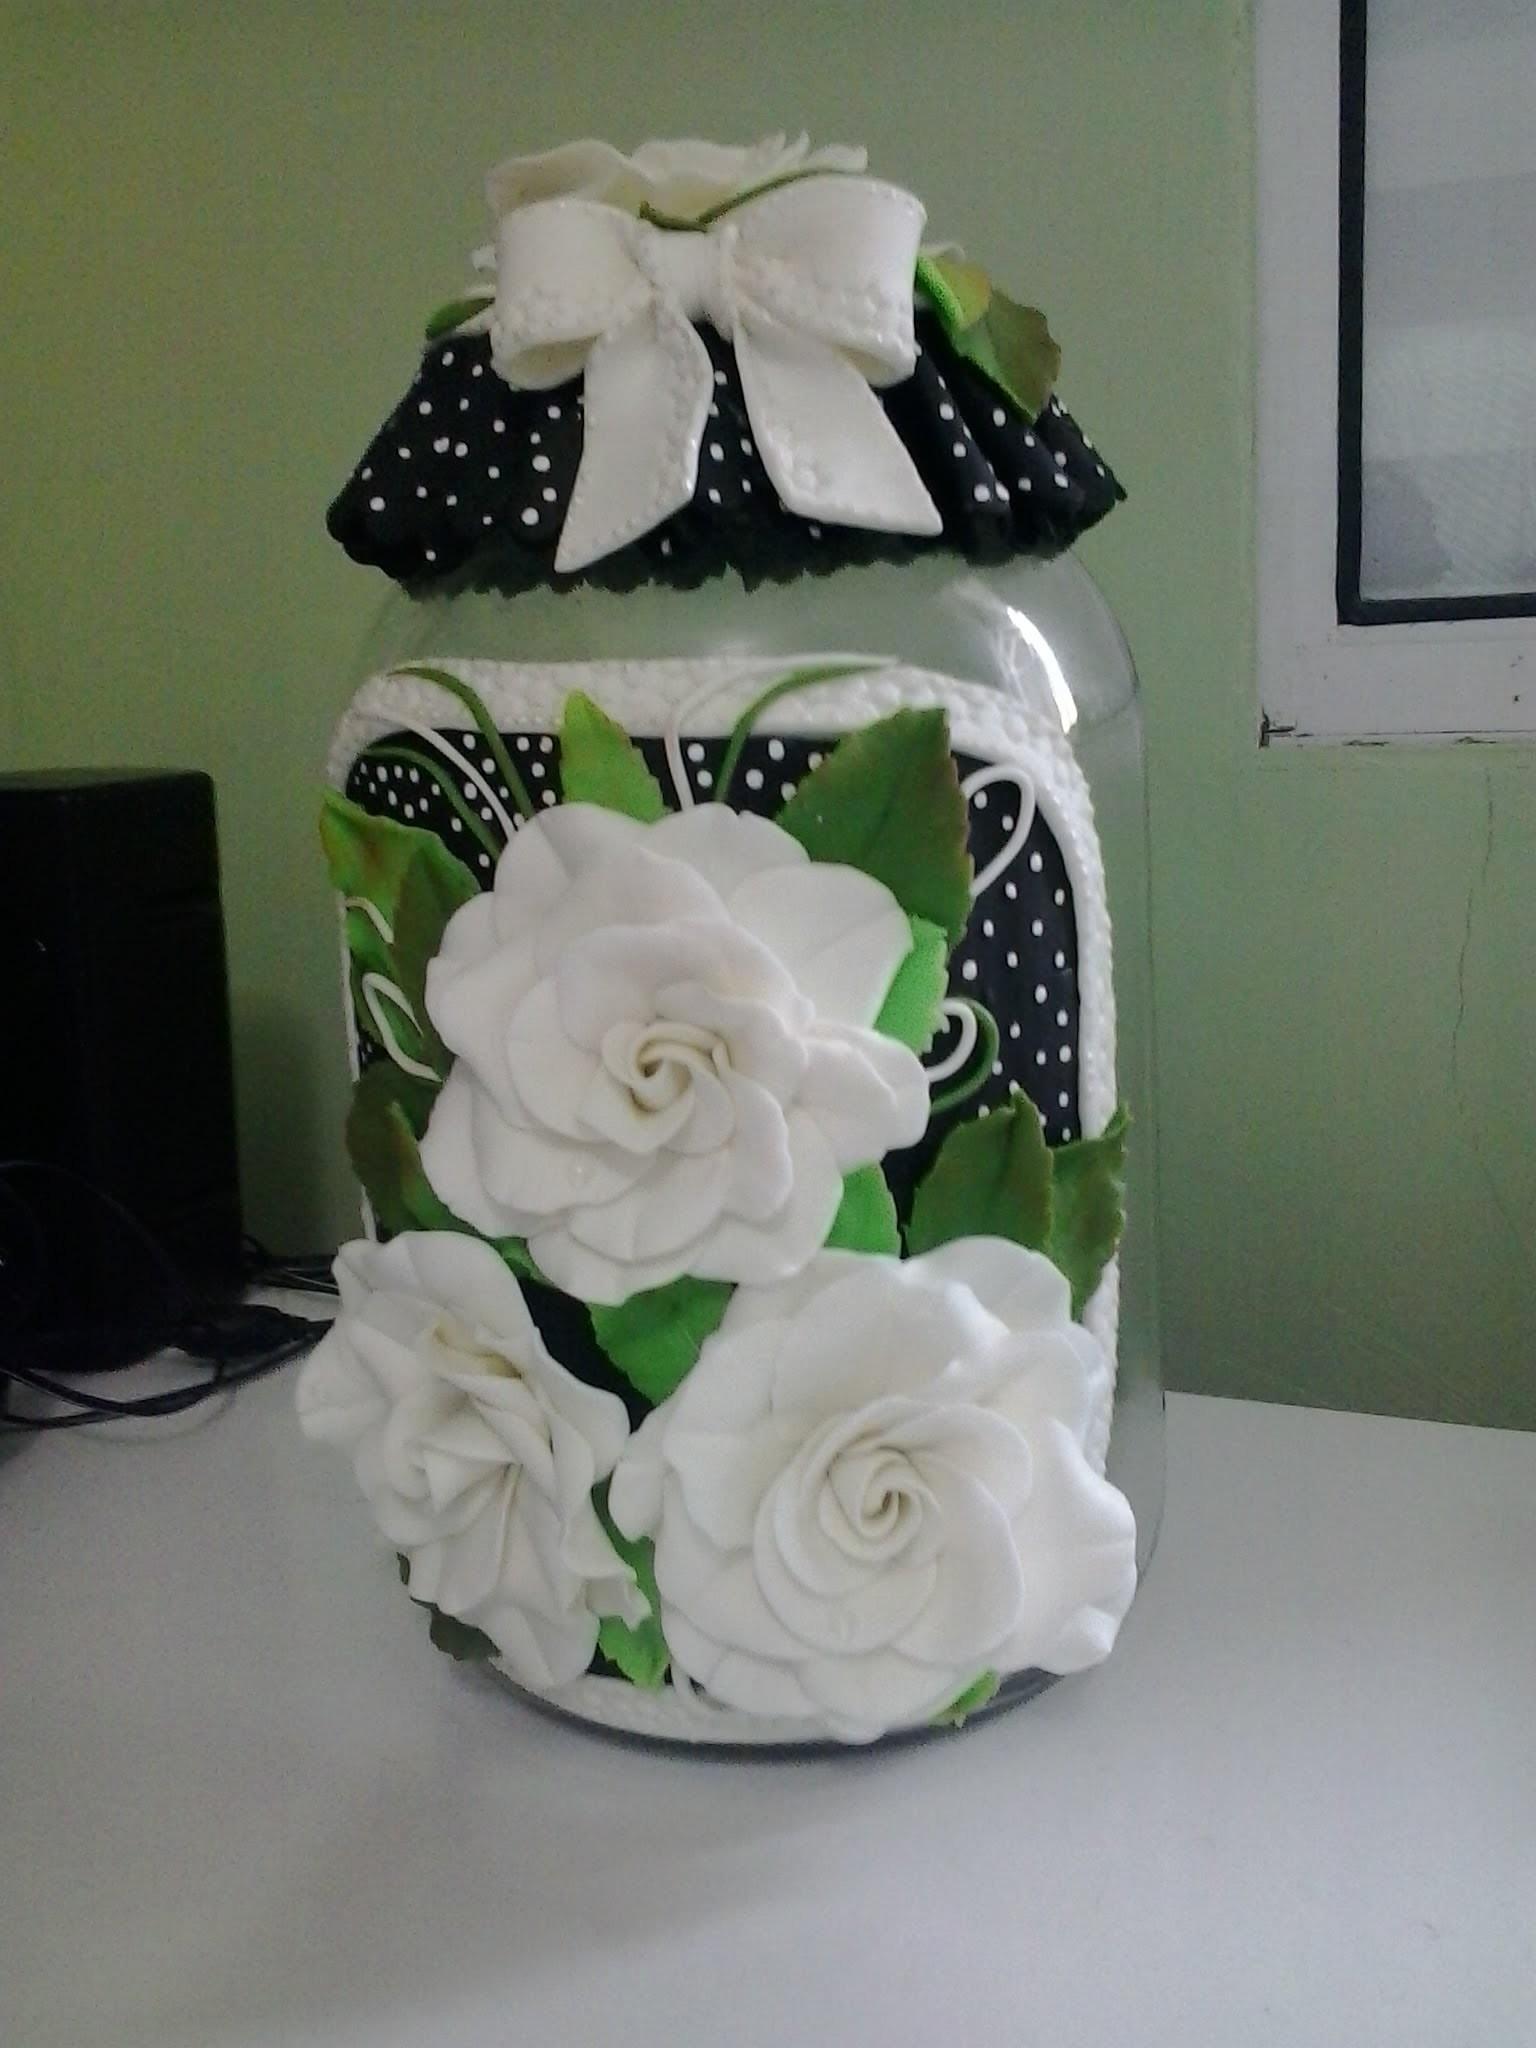 Passo a Passo Pote de Rosas em Biscuit _Ateliê Lucilia Dantas_* Arte em Biscuit* parte 2.5